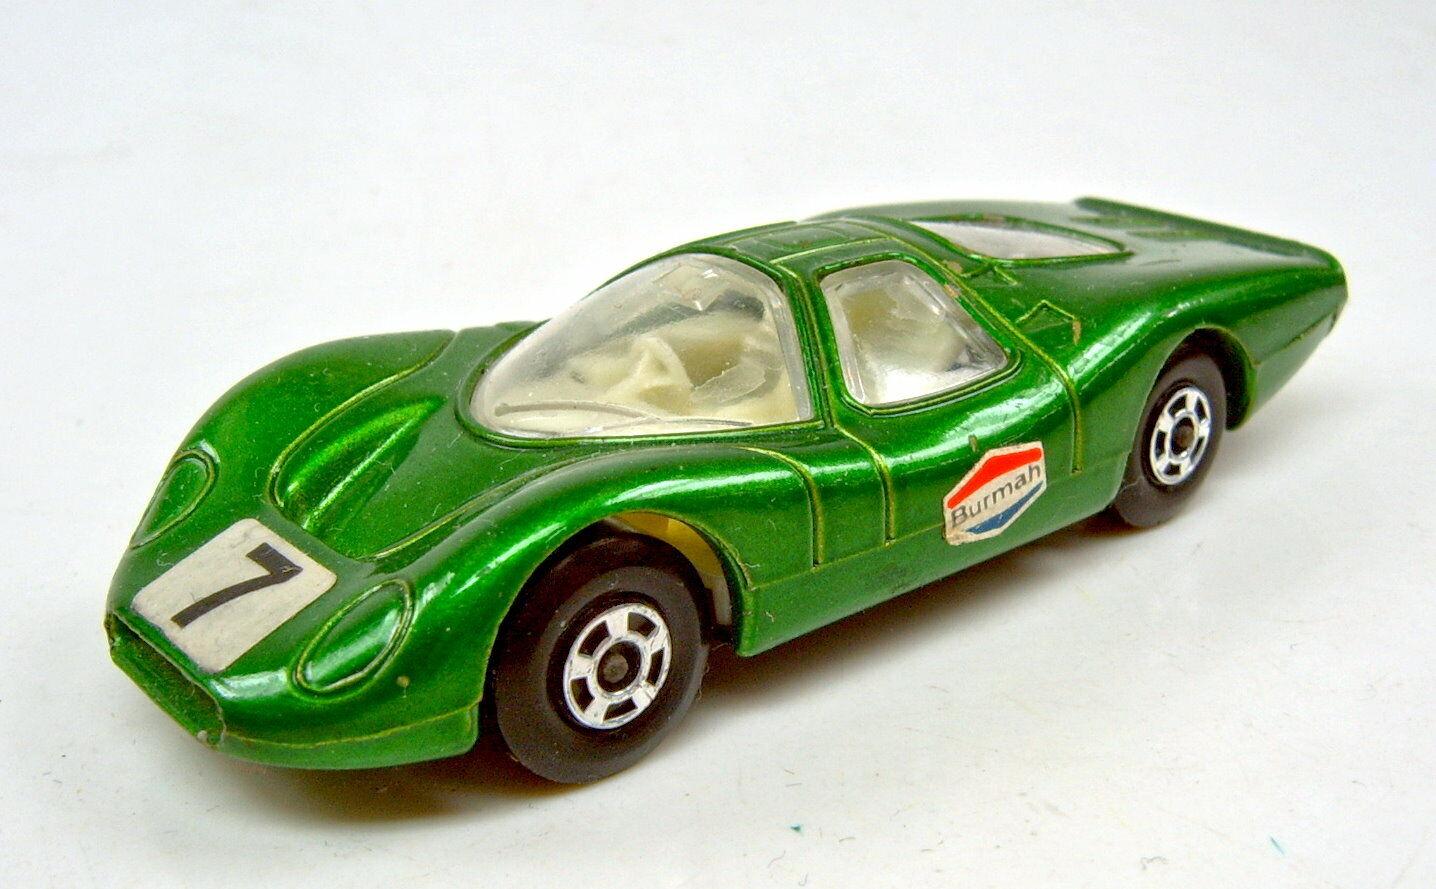 Matchbox Superfast Nr.45A Ford Group 6 grünmetallic  7 & Burmah  Aufkleber  | Geeignet für Farbe